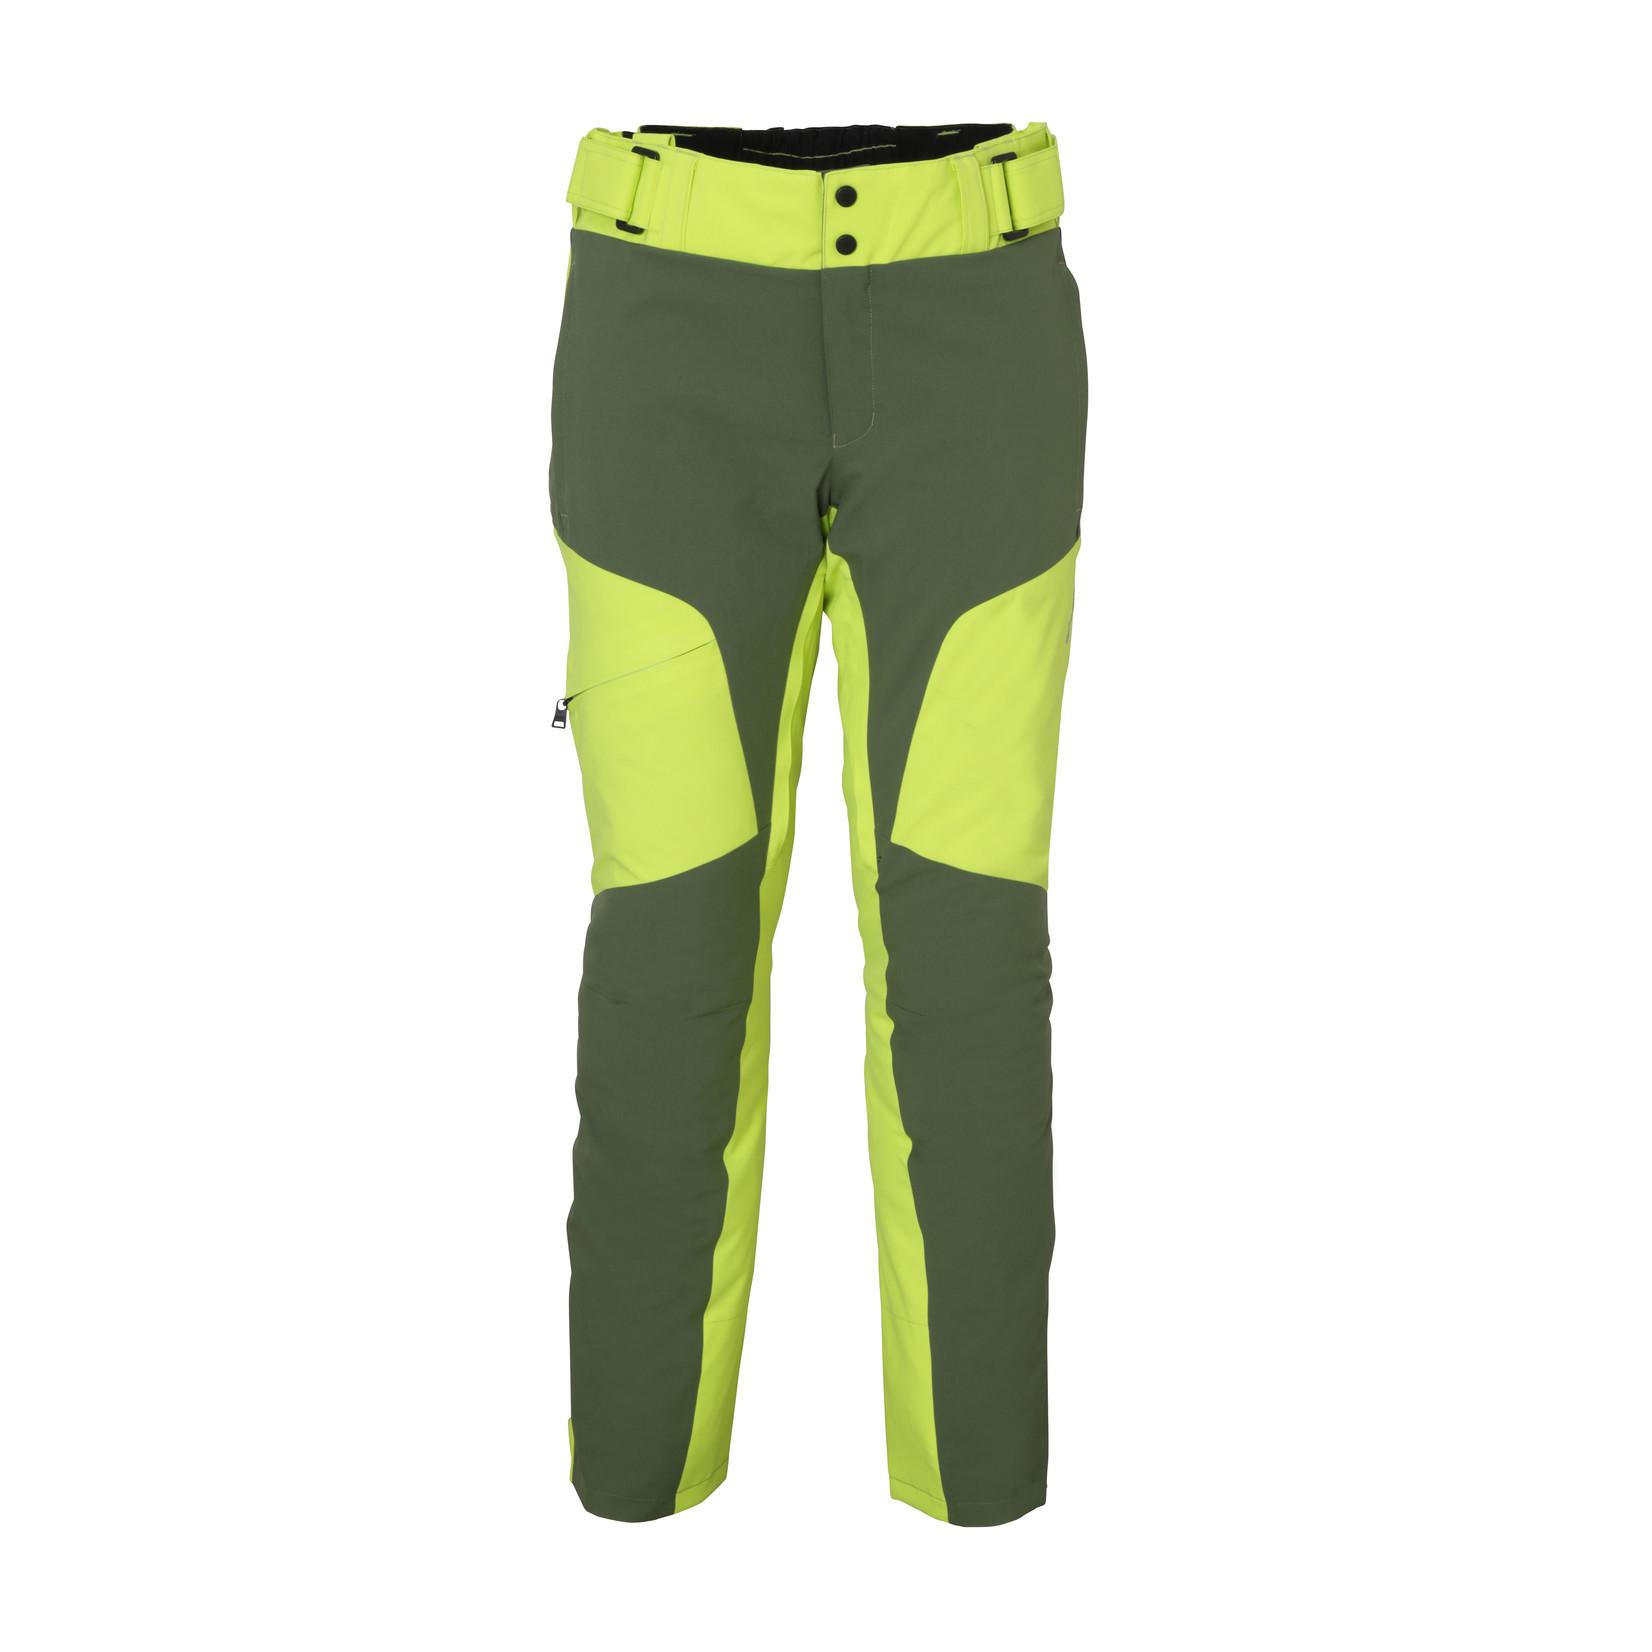 PHENIX Slope Pants